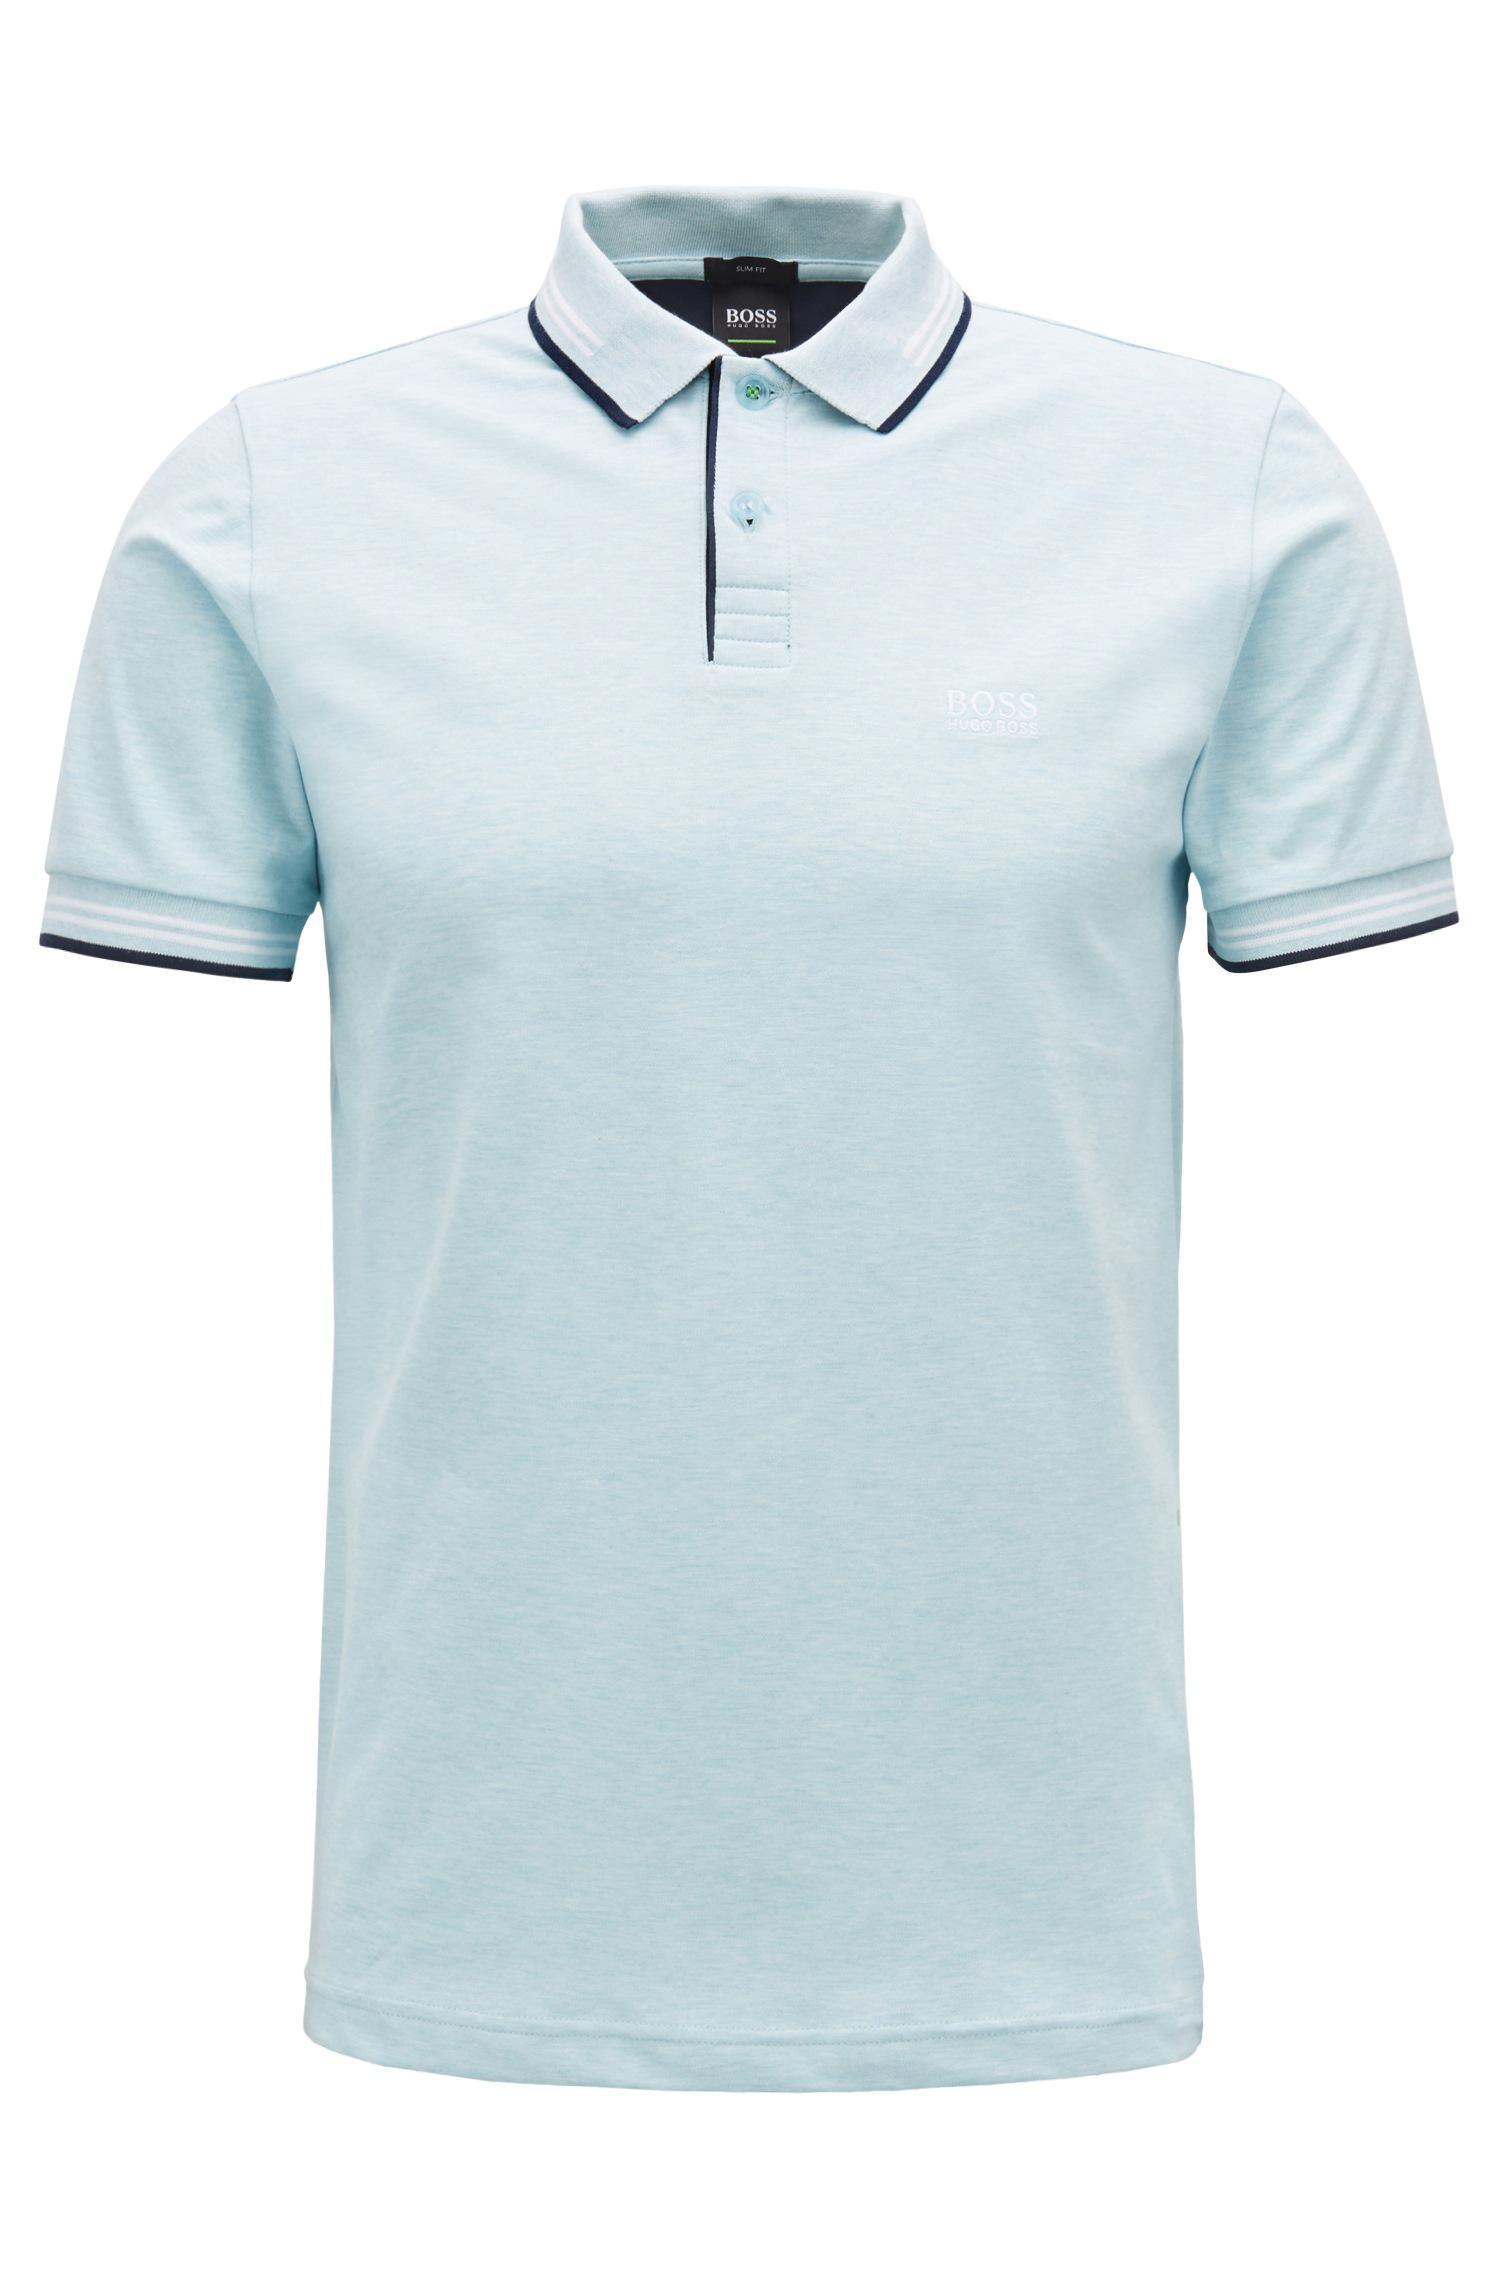 ce3a18a7 Hugo Boss Slim Fit Polo Shirt In Stretch Cotton Piqué | RLDM